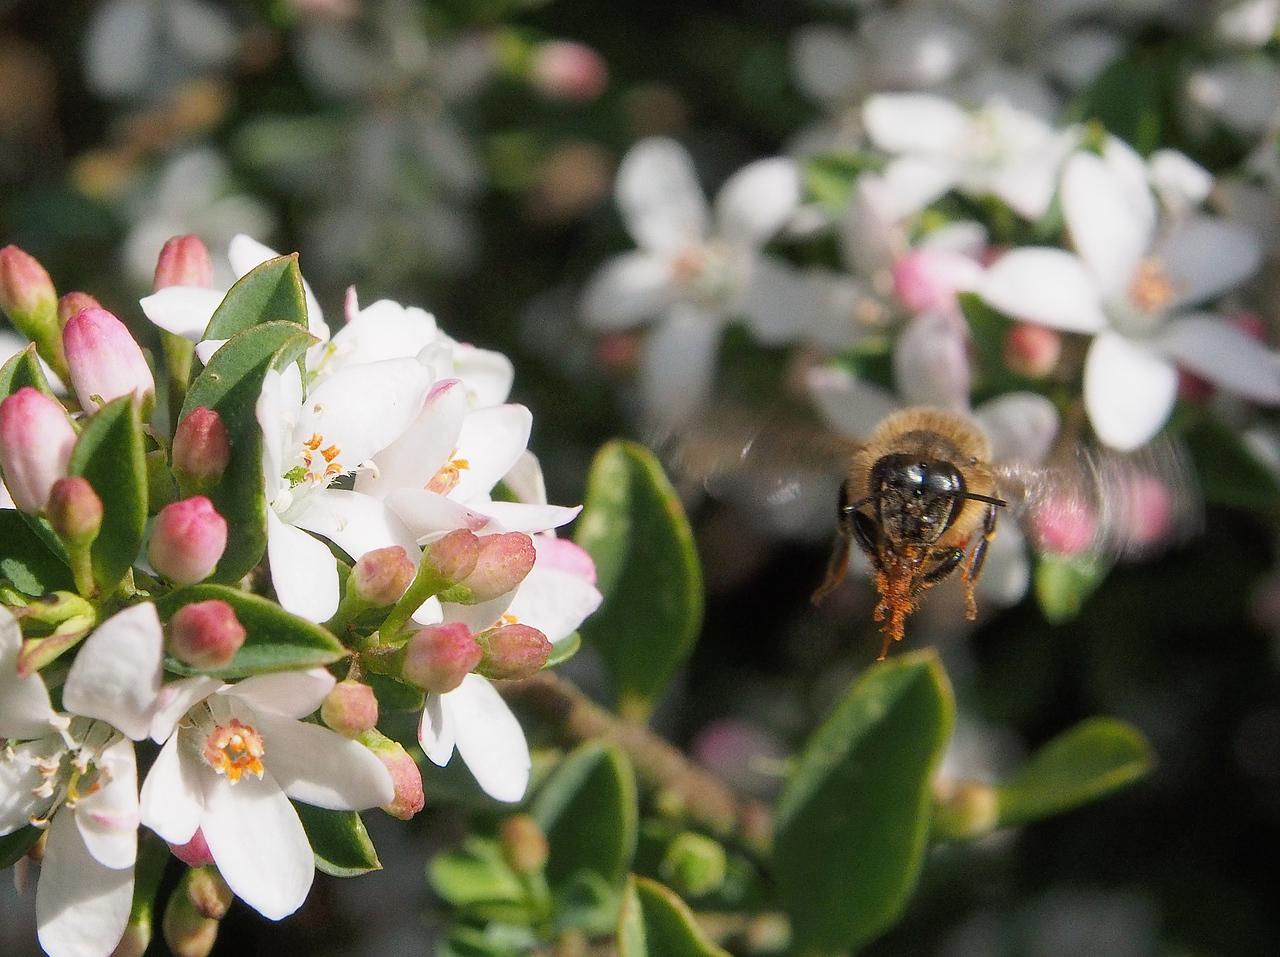 20130901_1215_1635 Kew Baptist bee